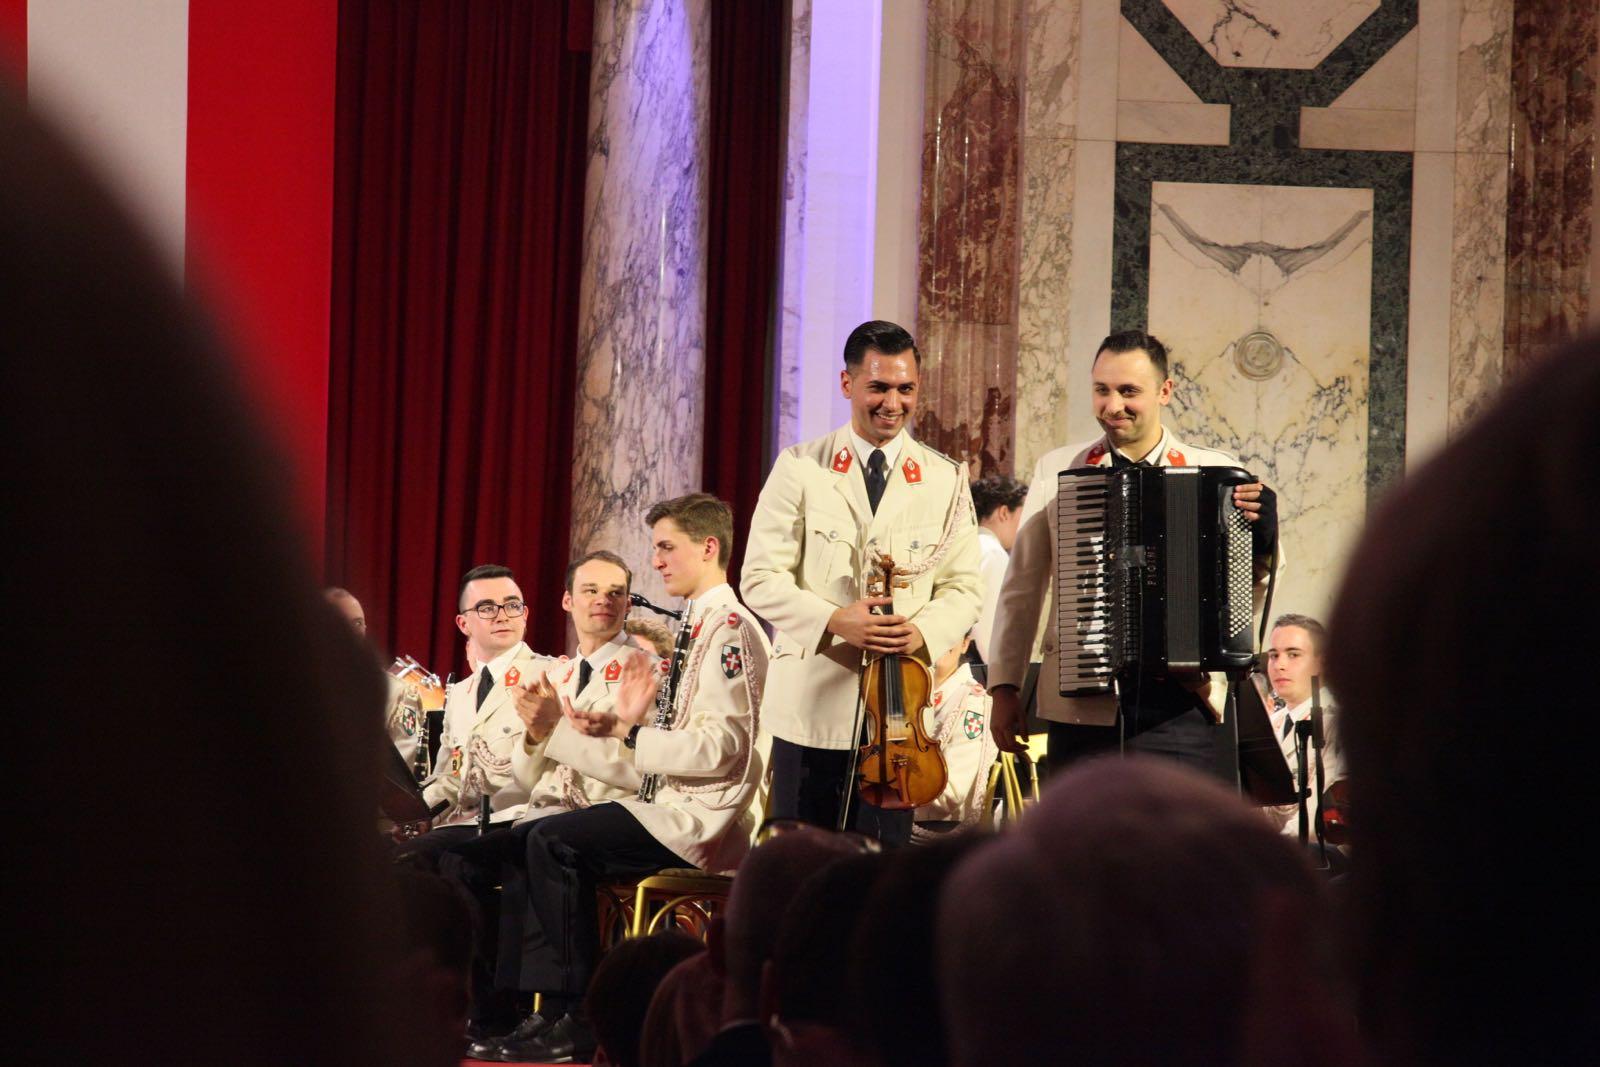 2019_03_14Gardemusik_Frühjahrskonzert_HBP_Hofburg - 103 of 177